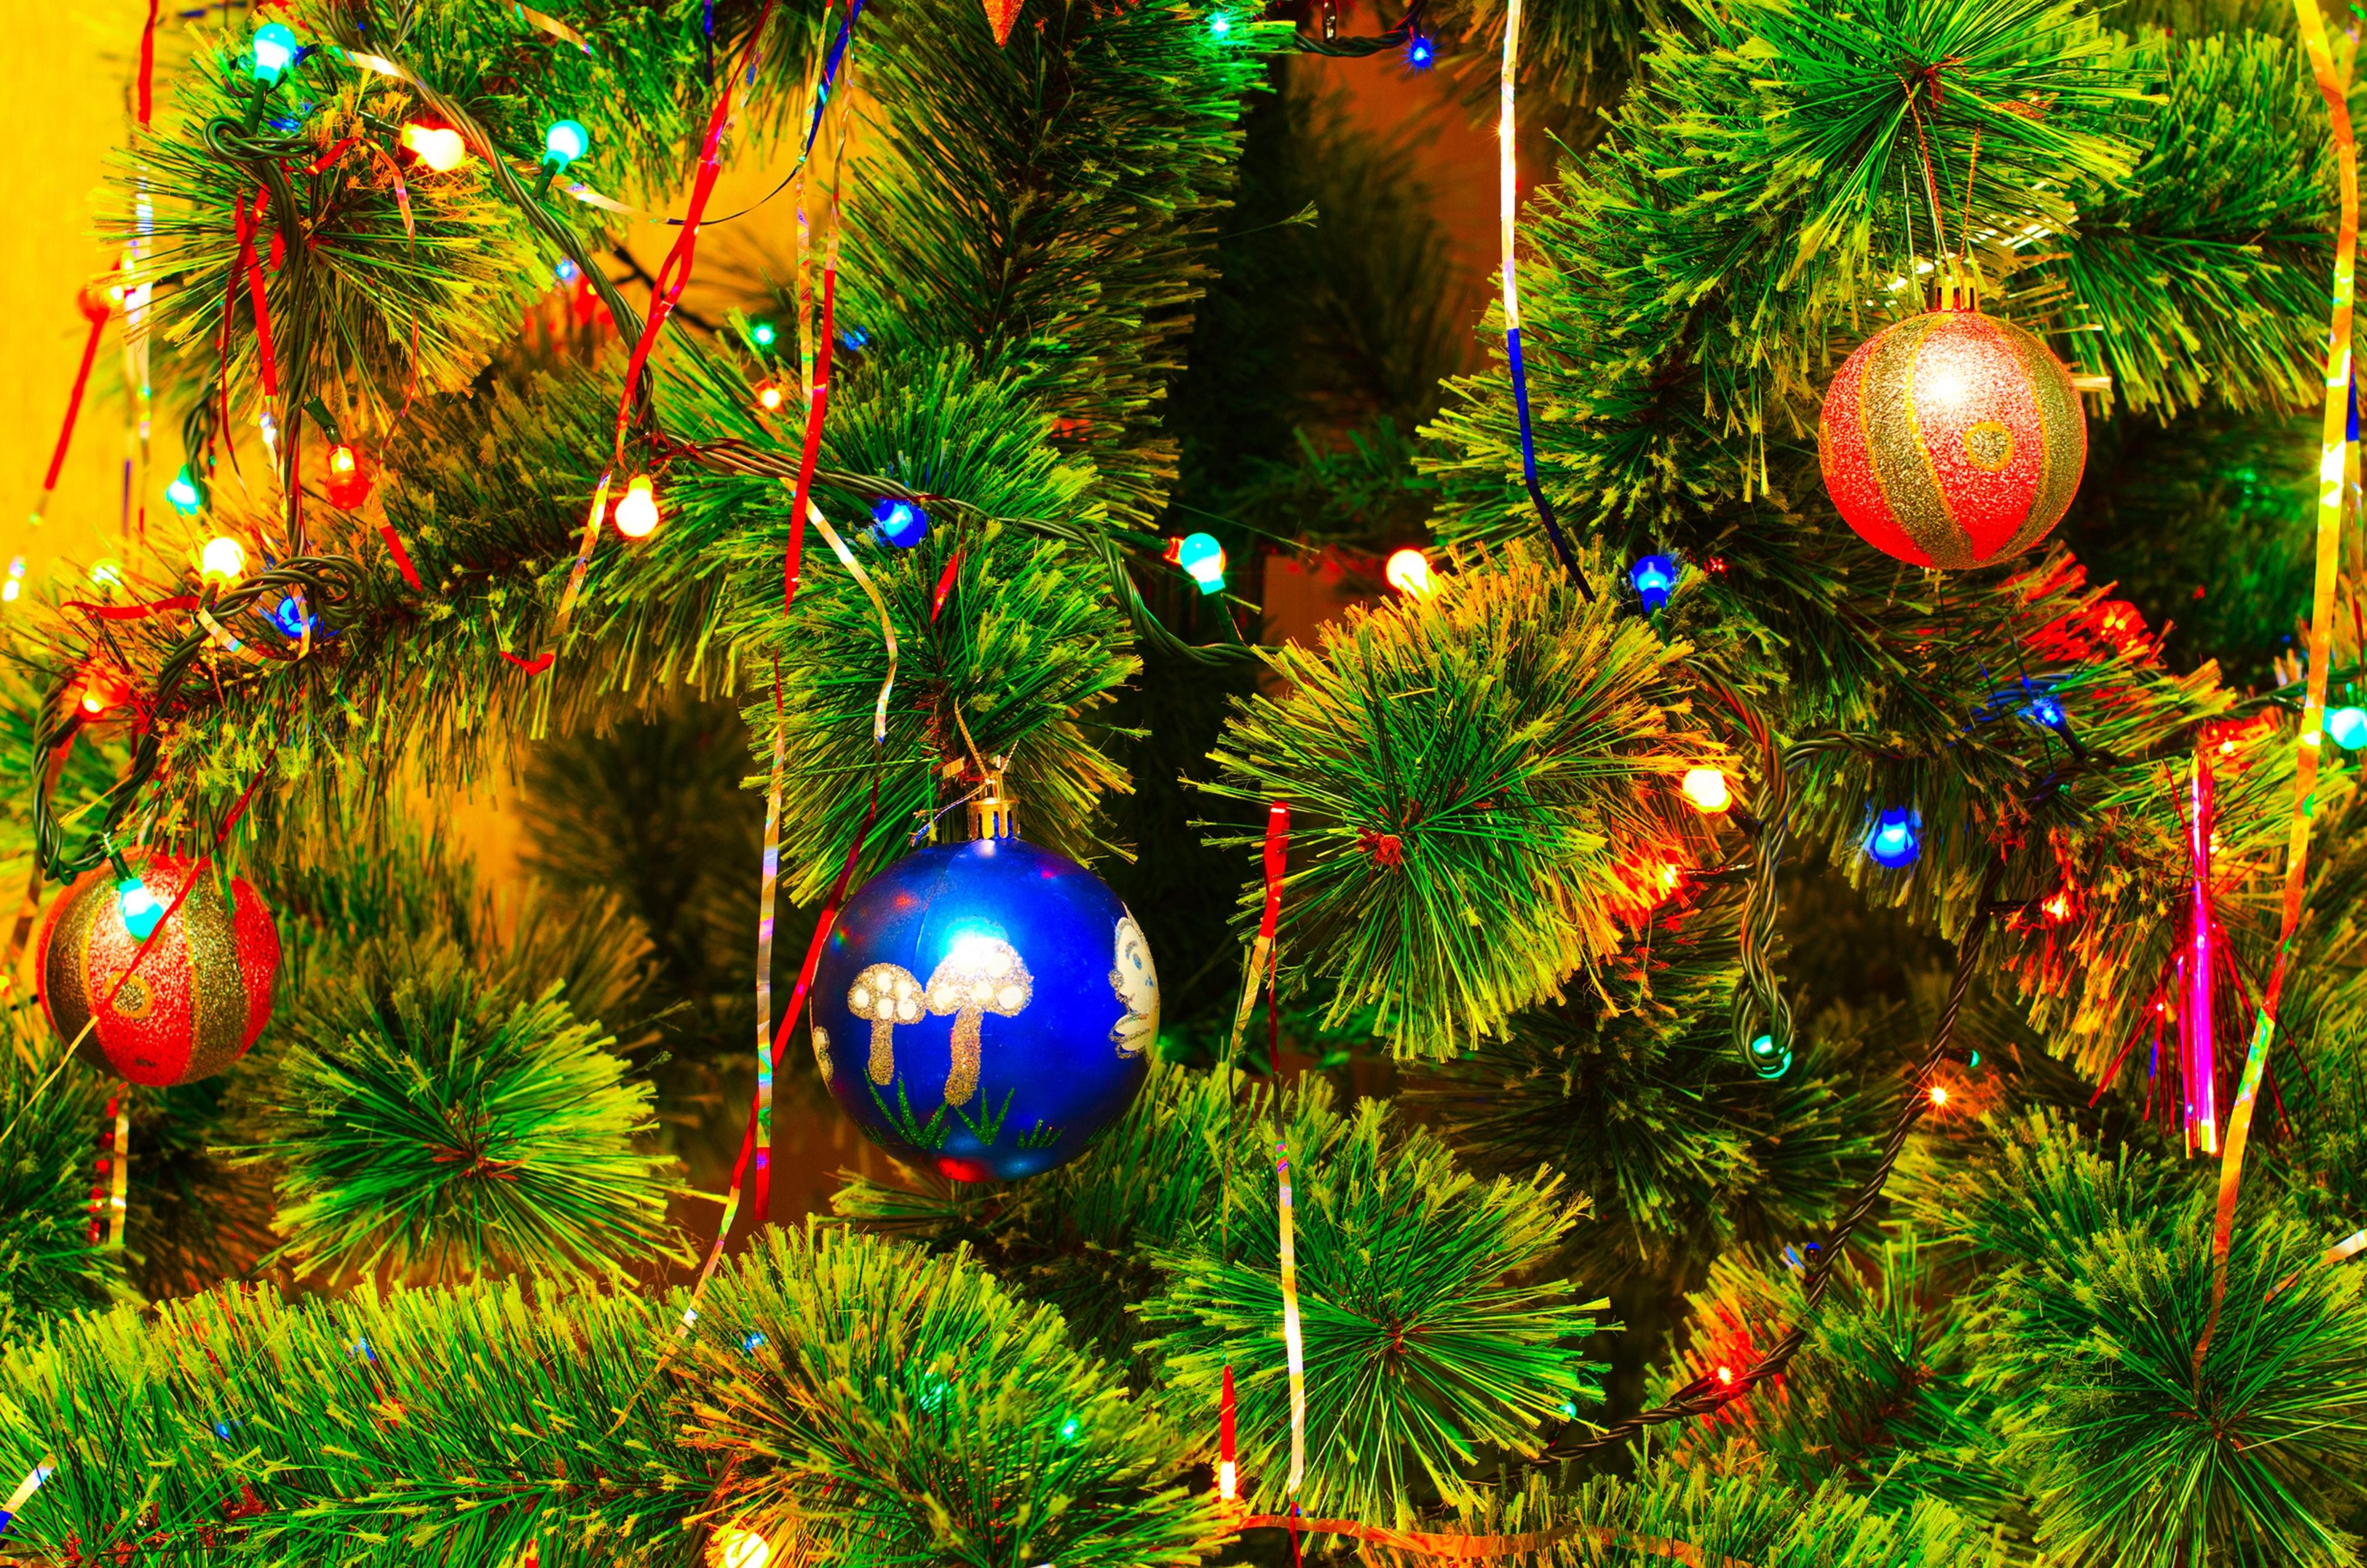 Картинки новогодней елочки с шарами